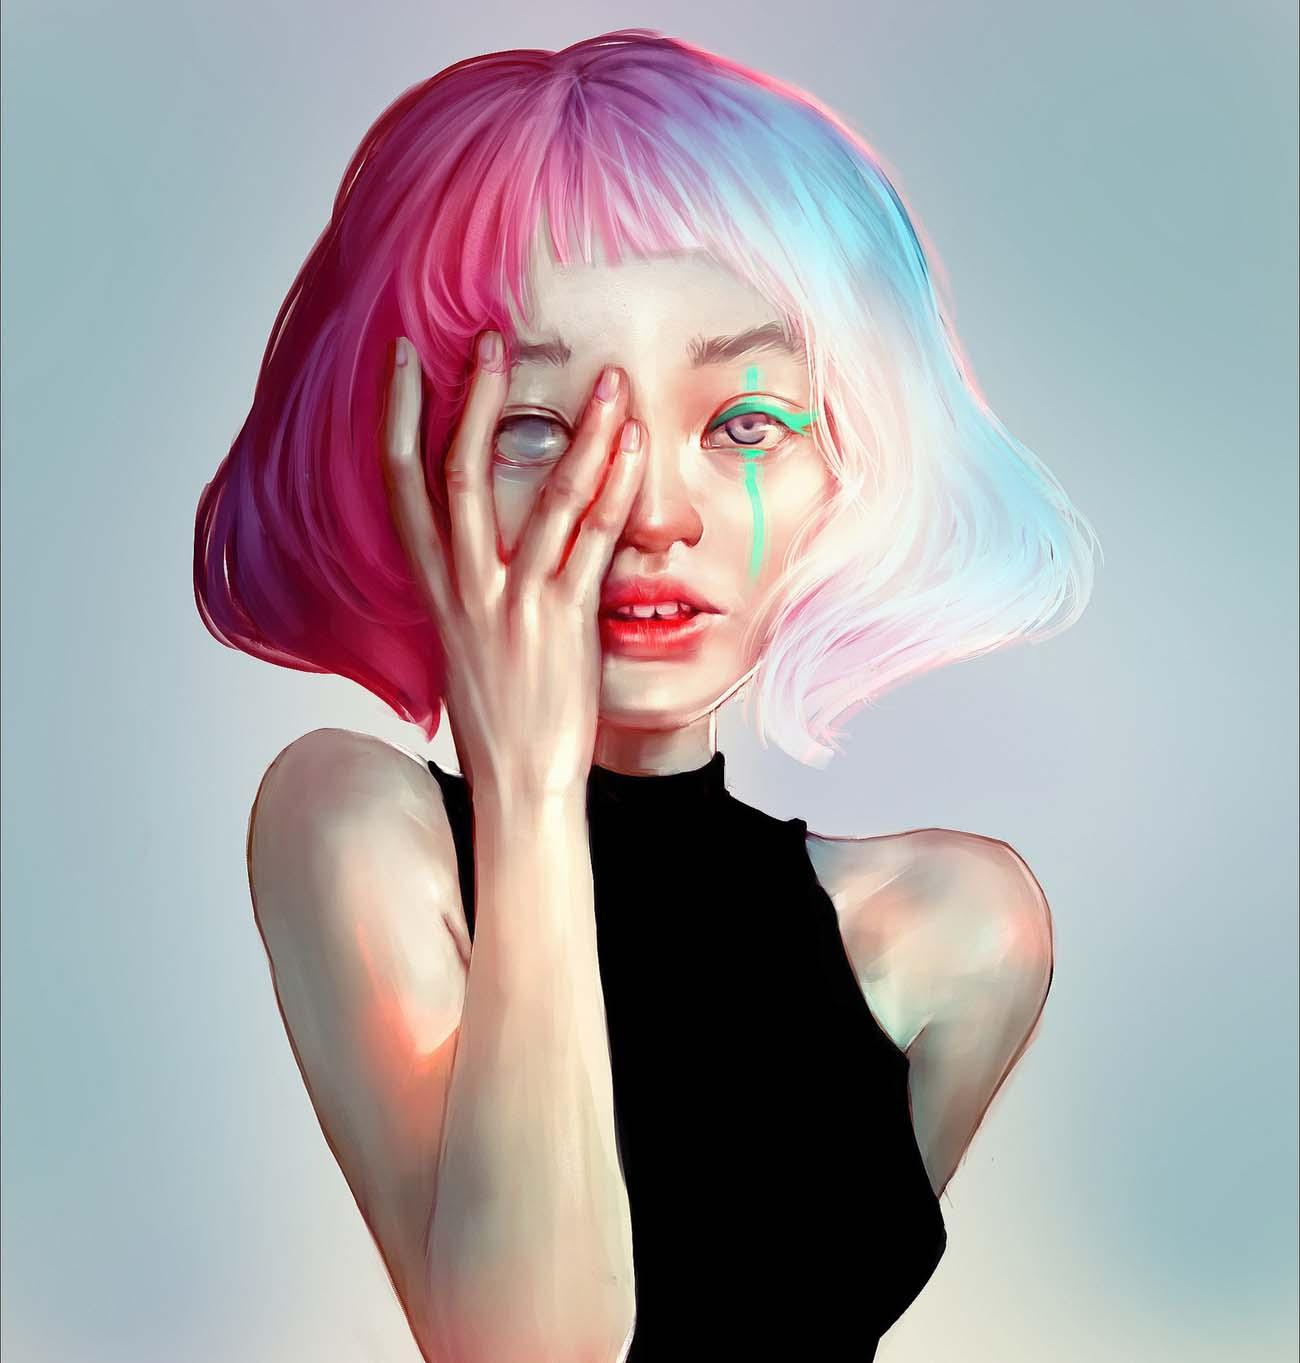 Ilse Harting | Paintable.cc Digital Painting Inspiration - Learn the Art of Digital Painting! #digitalpainting #digitalart